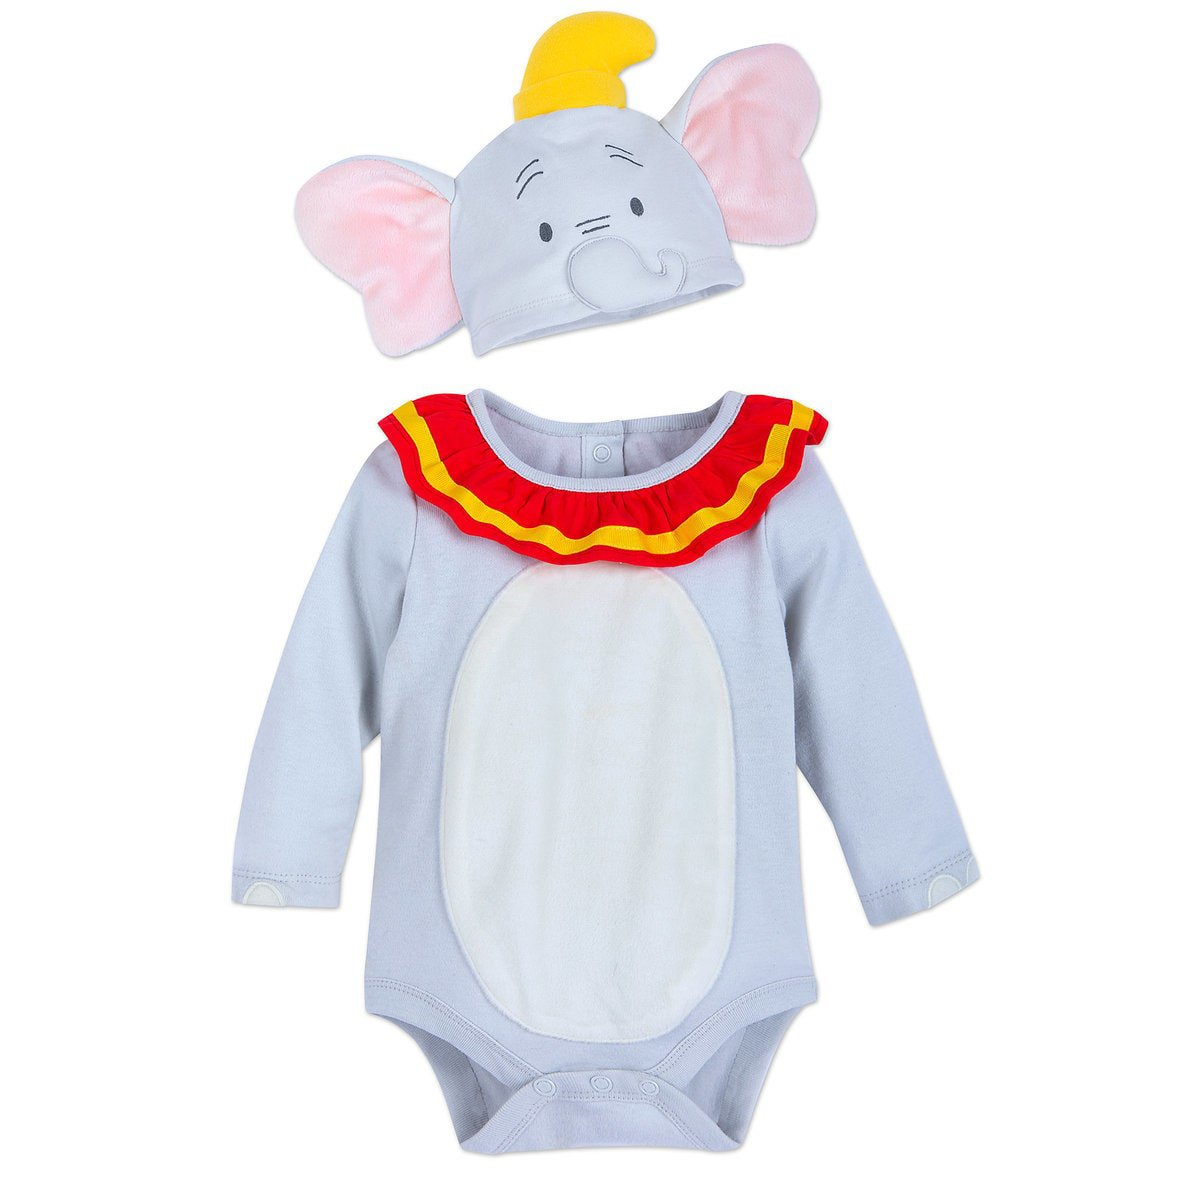 Disney Store Dumbo Baby Costume Bodysuit Hat 0-3 Months 2019 New